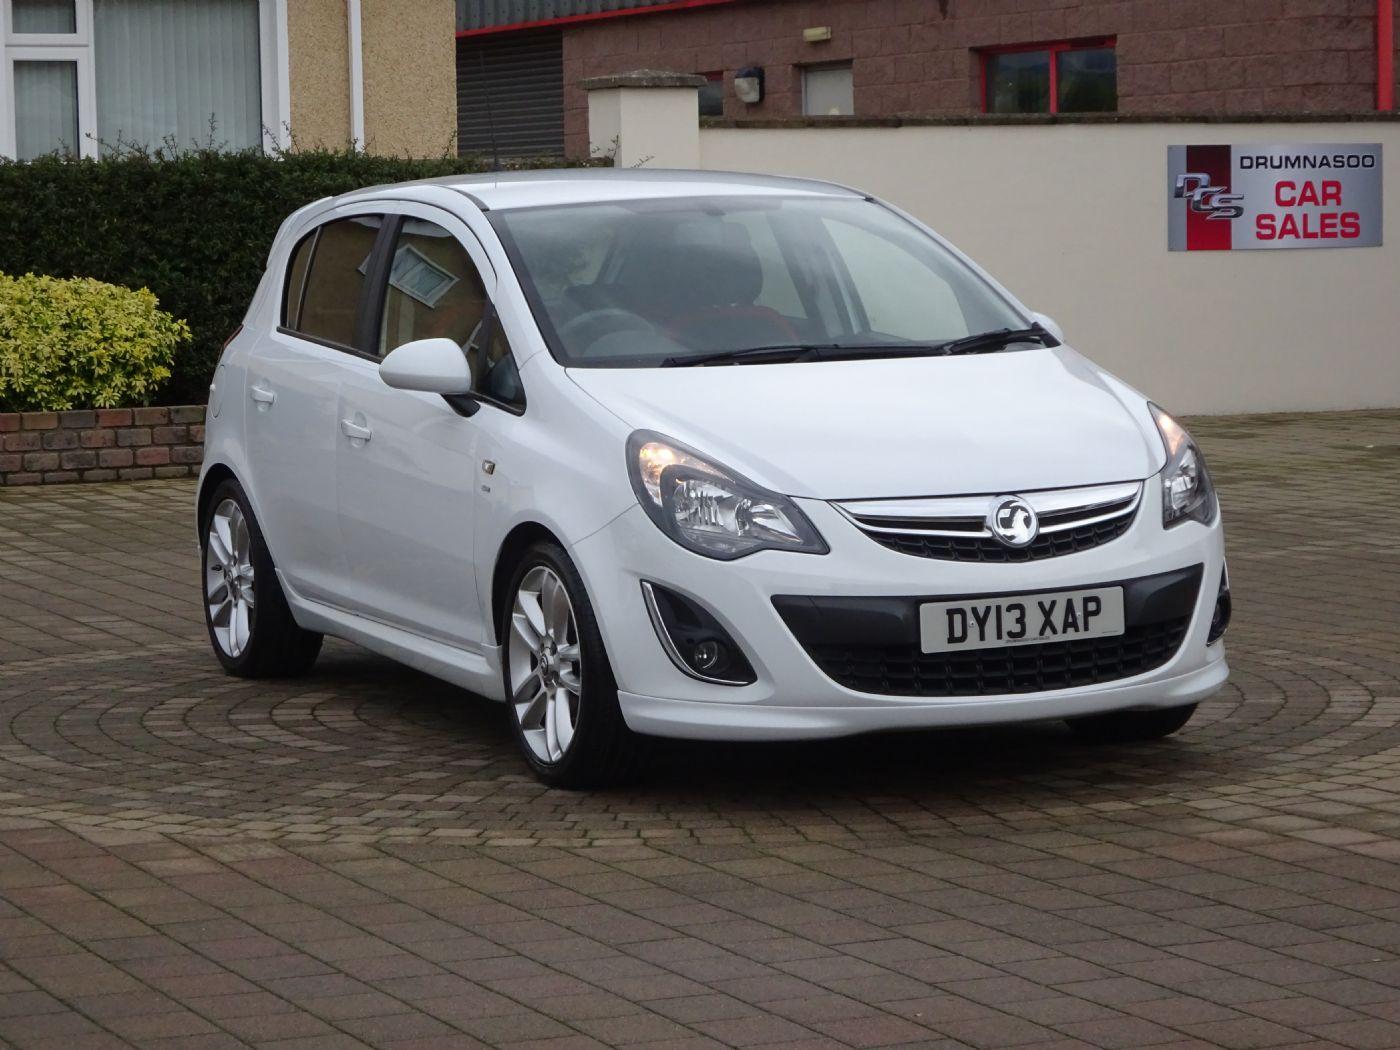 Vauxhall Corsa 1.4 5Dr, Cruise control